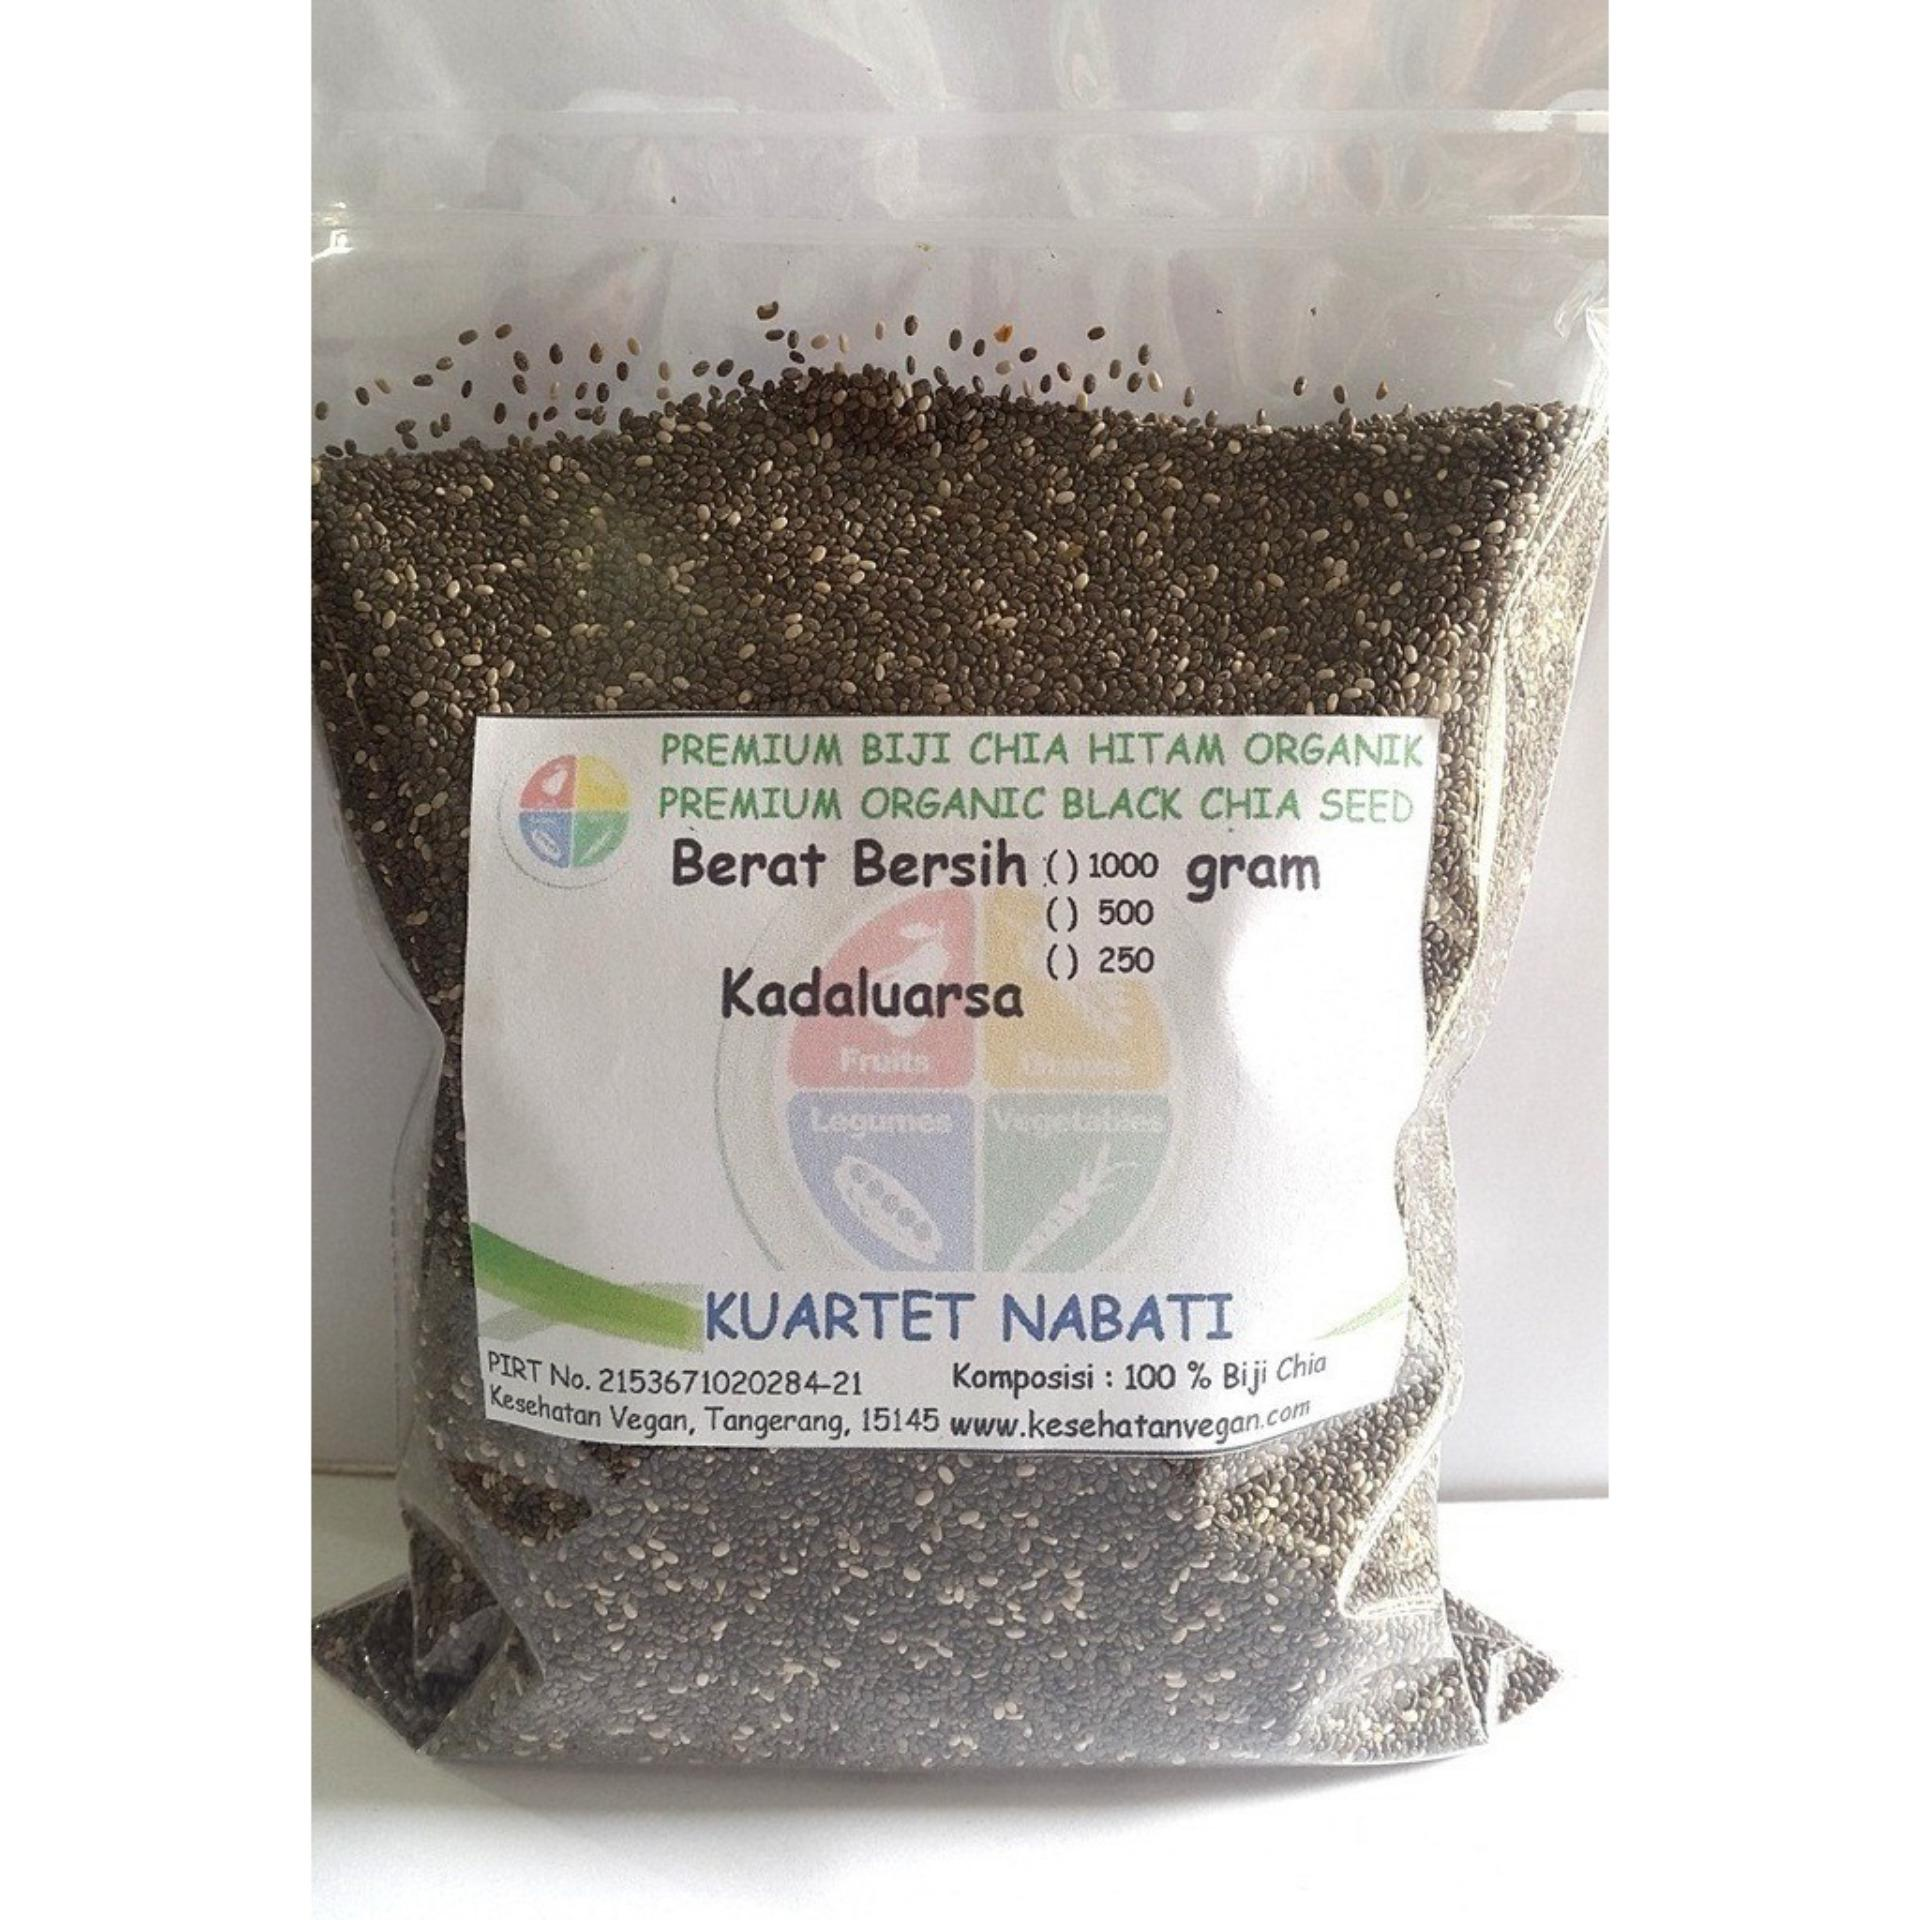 Rendys Vg 140ml Vegetable Glycerin Gliserin Nabati Daftar Harga Wilmar 1 Liter Kuartet Premium Organic Black Chia Seed Biji Hitam Organik 250 Gr